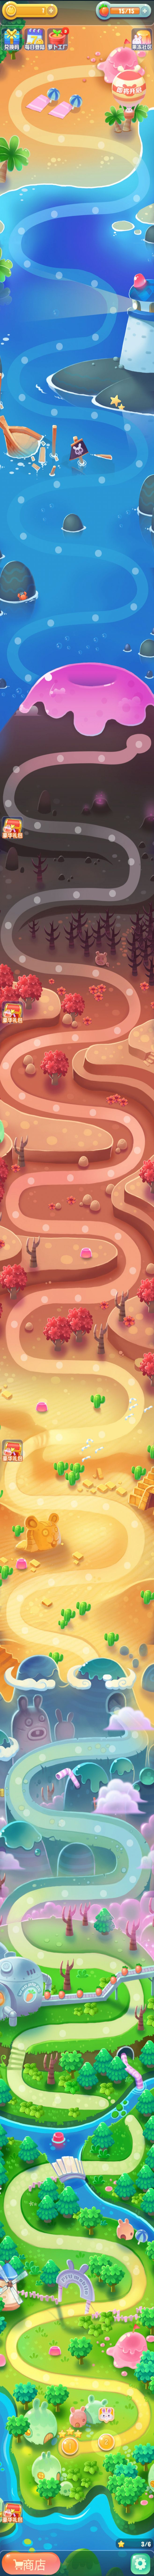 SilenceMo采集到GAME UI(4440图)_花瓣平面设计